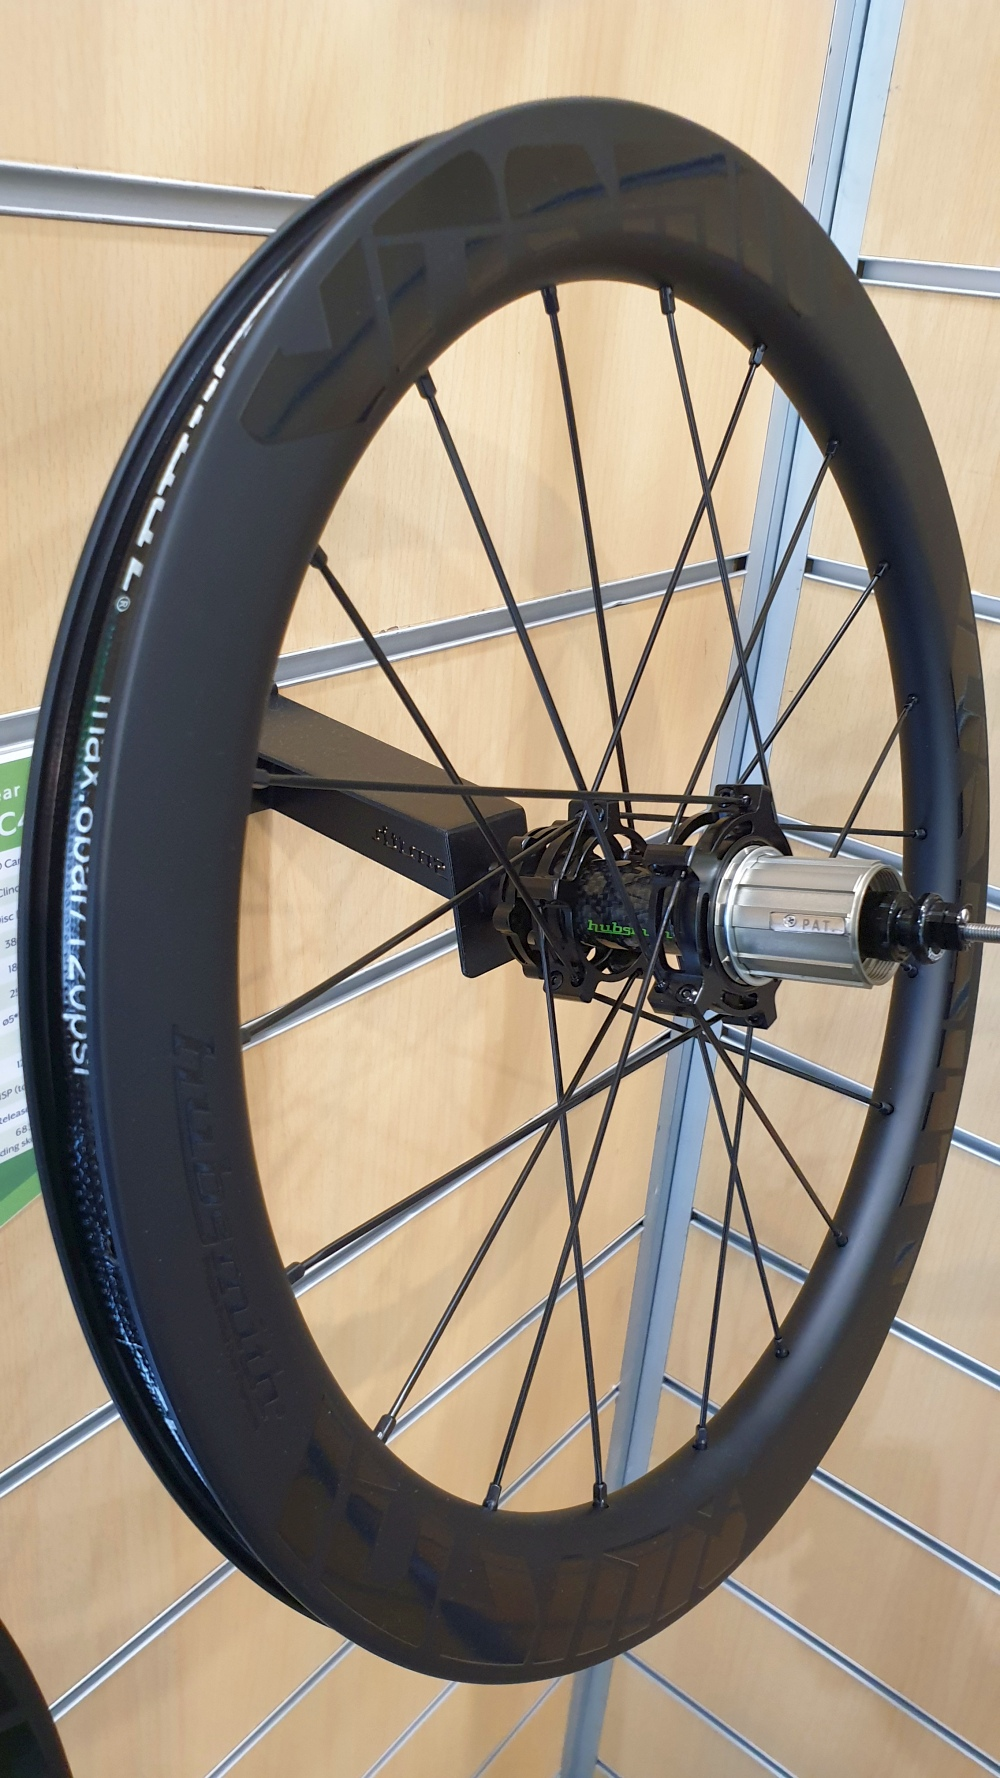 Hubsmith Carbon-Laufrad